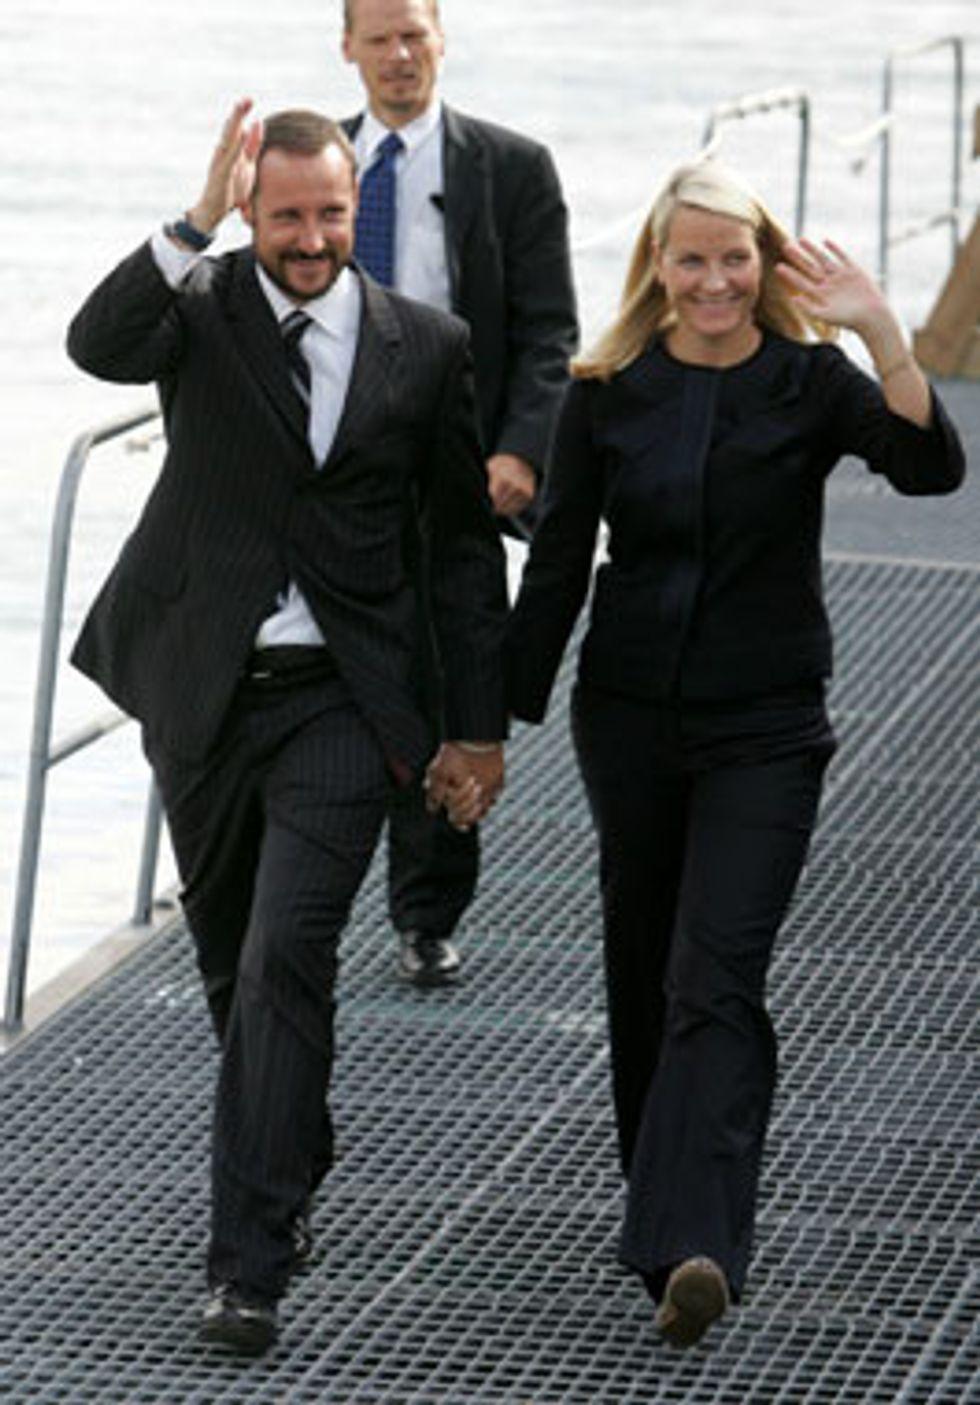 The Norwegian Crown Princely Couple on Tour